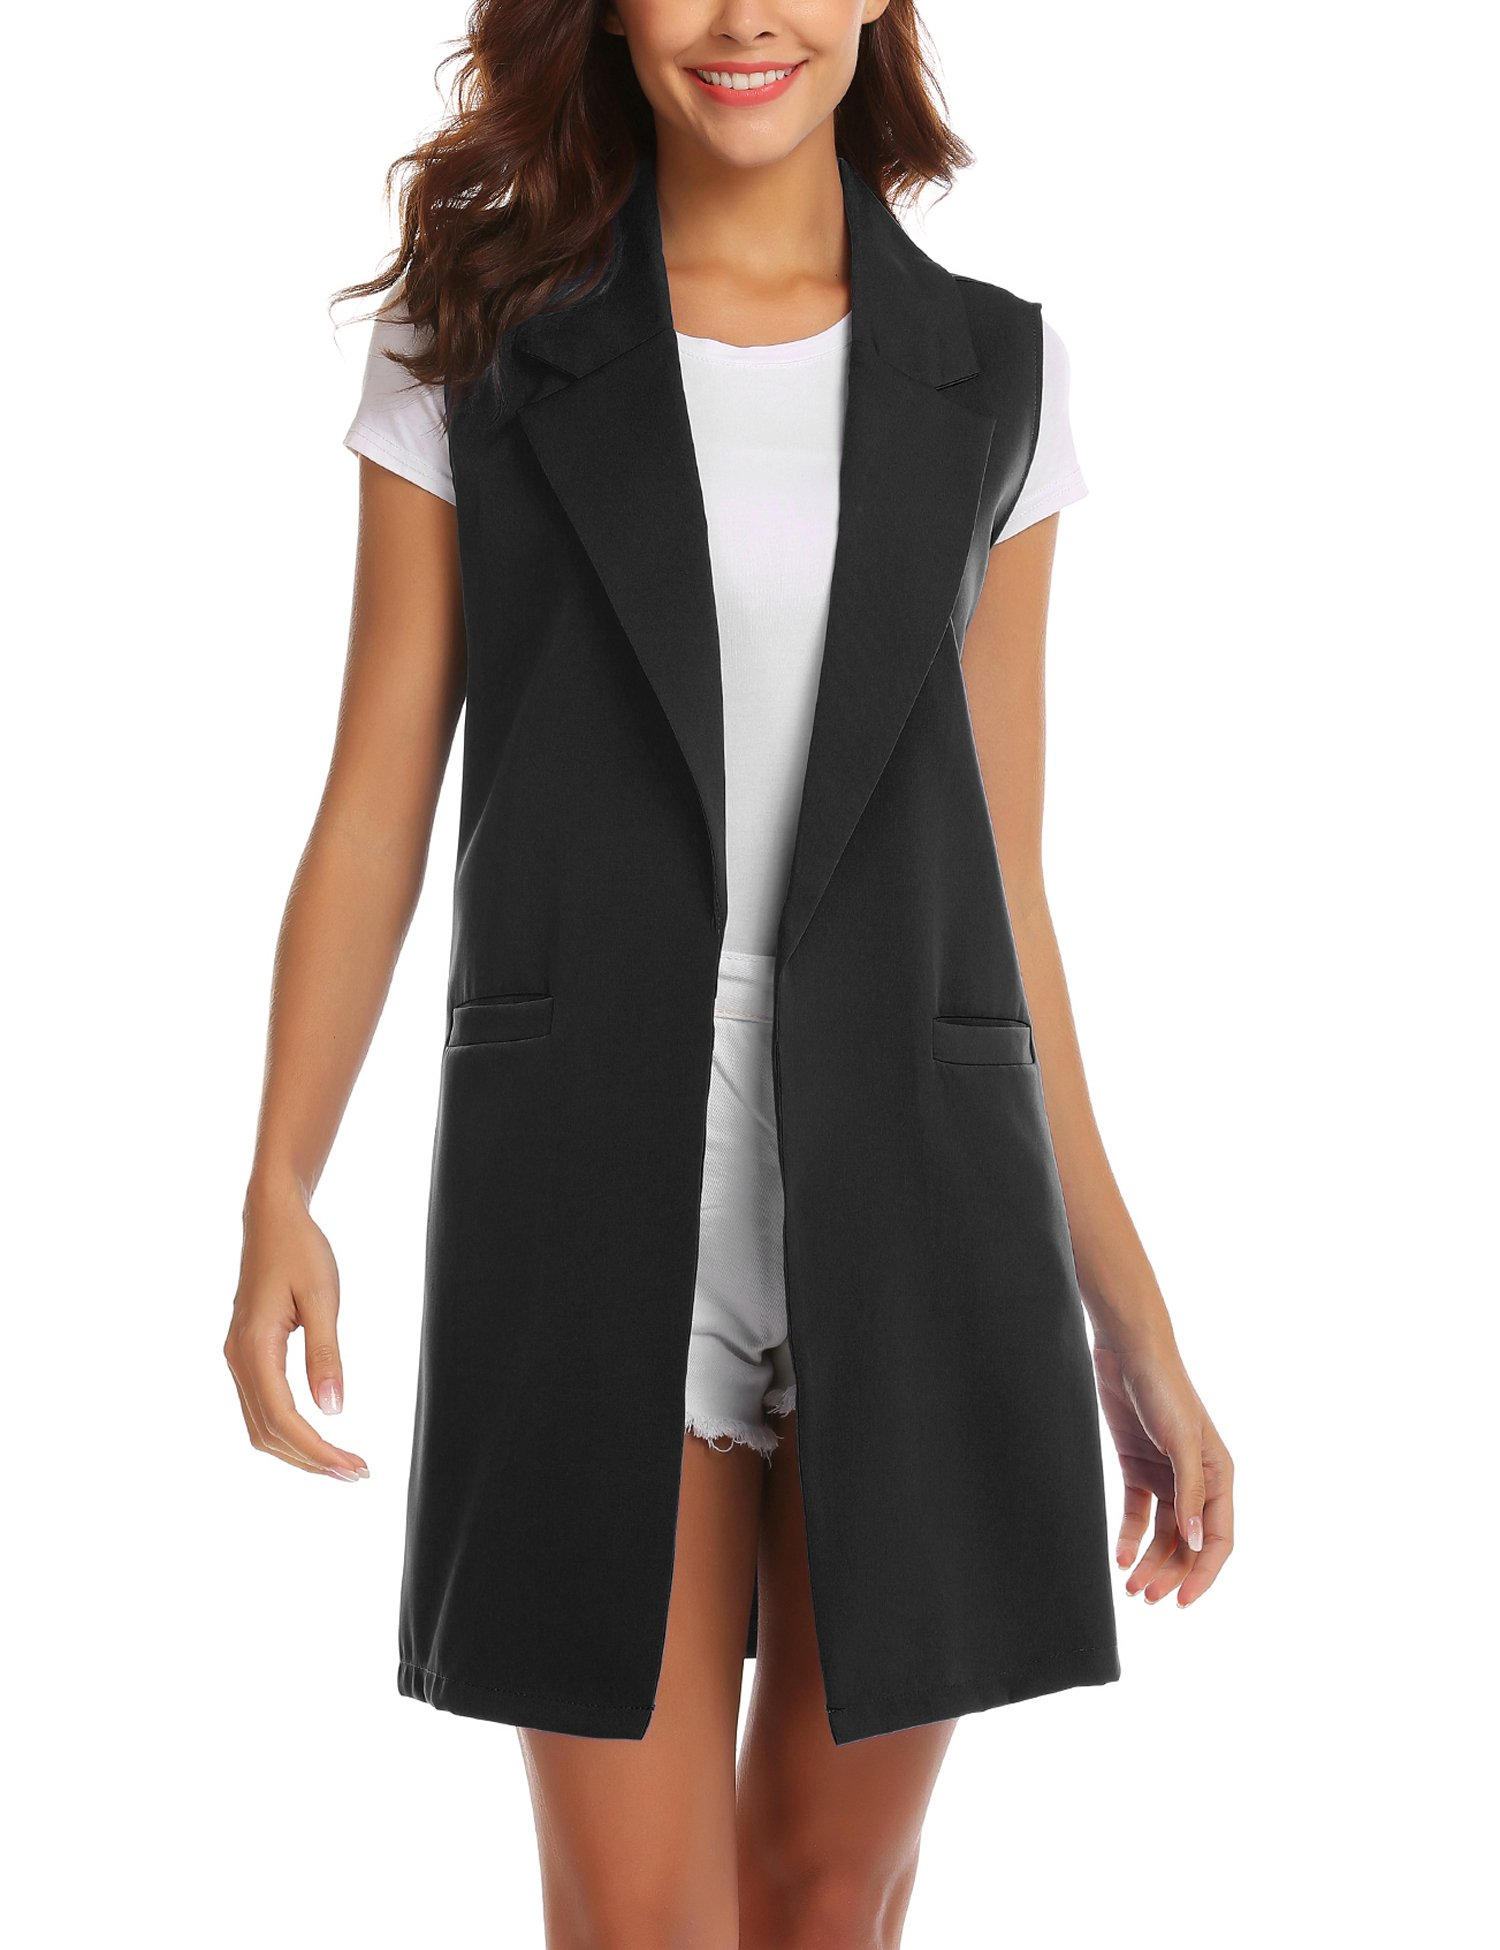 Showyoo Women's Long Sleeveless Duster Trench Vest Casual Lapel Blazer Jacket Black XL